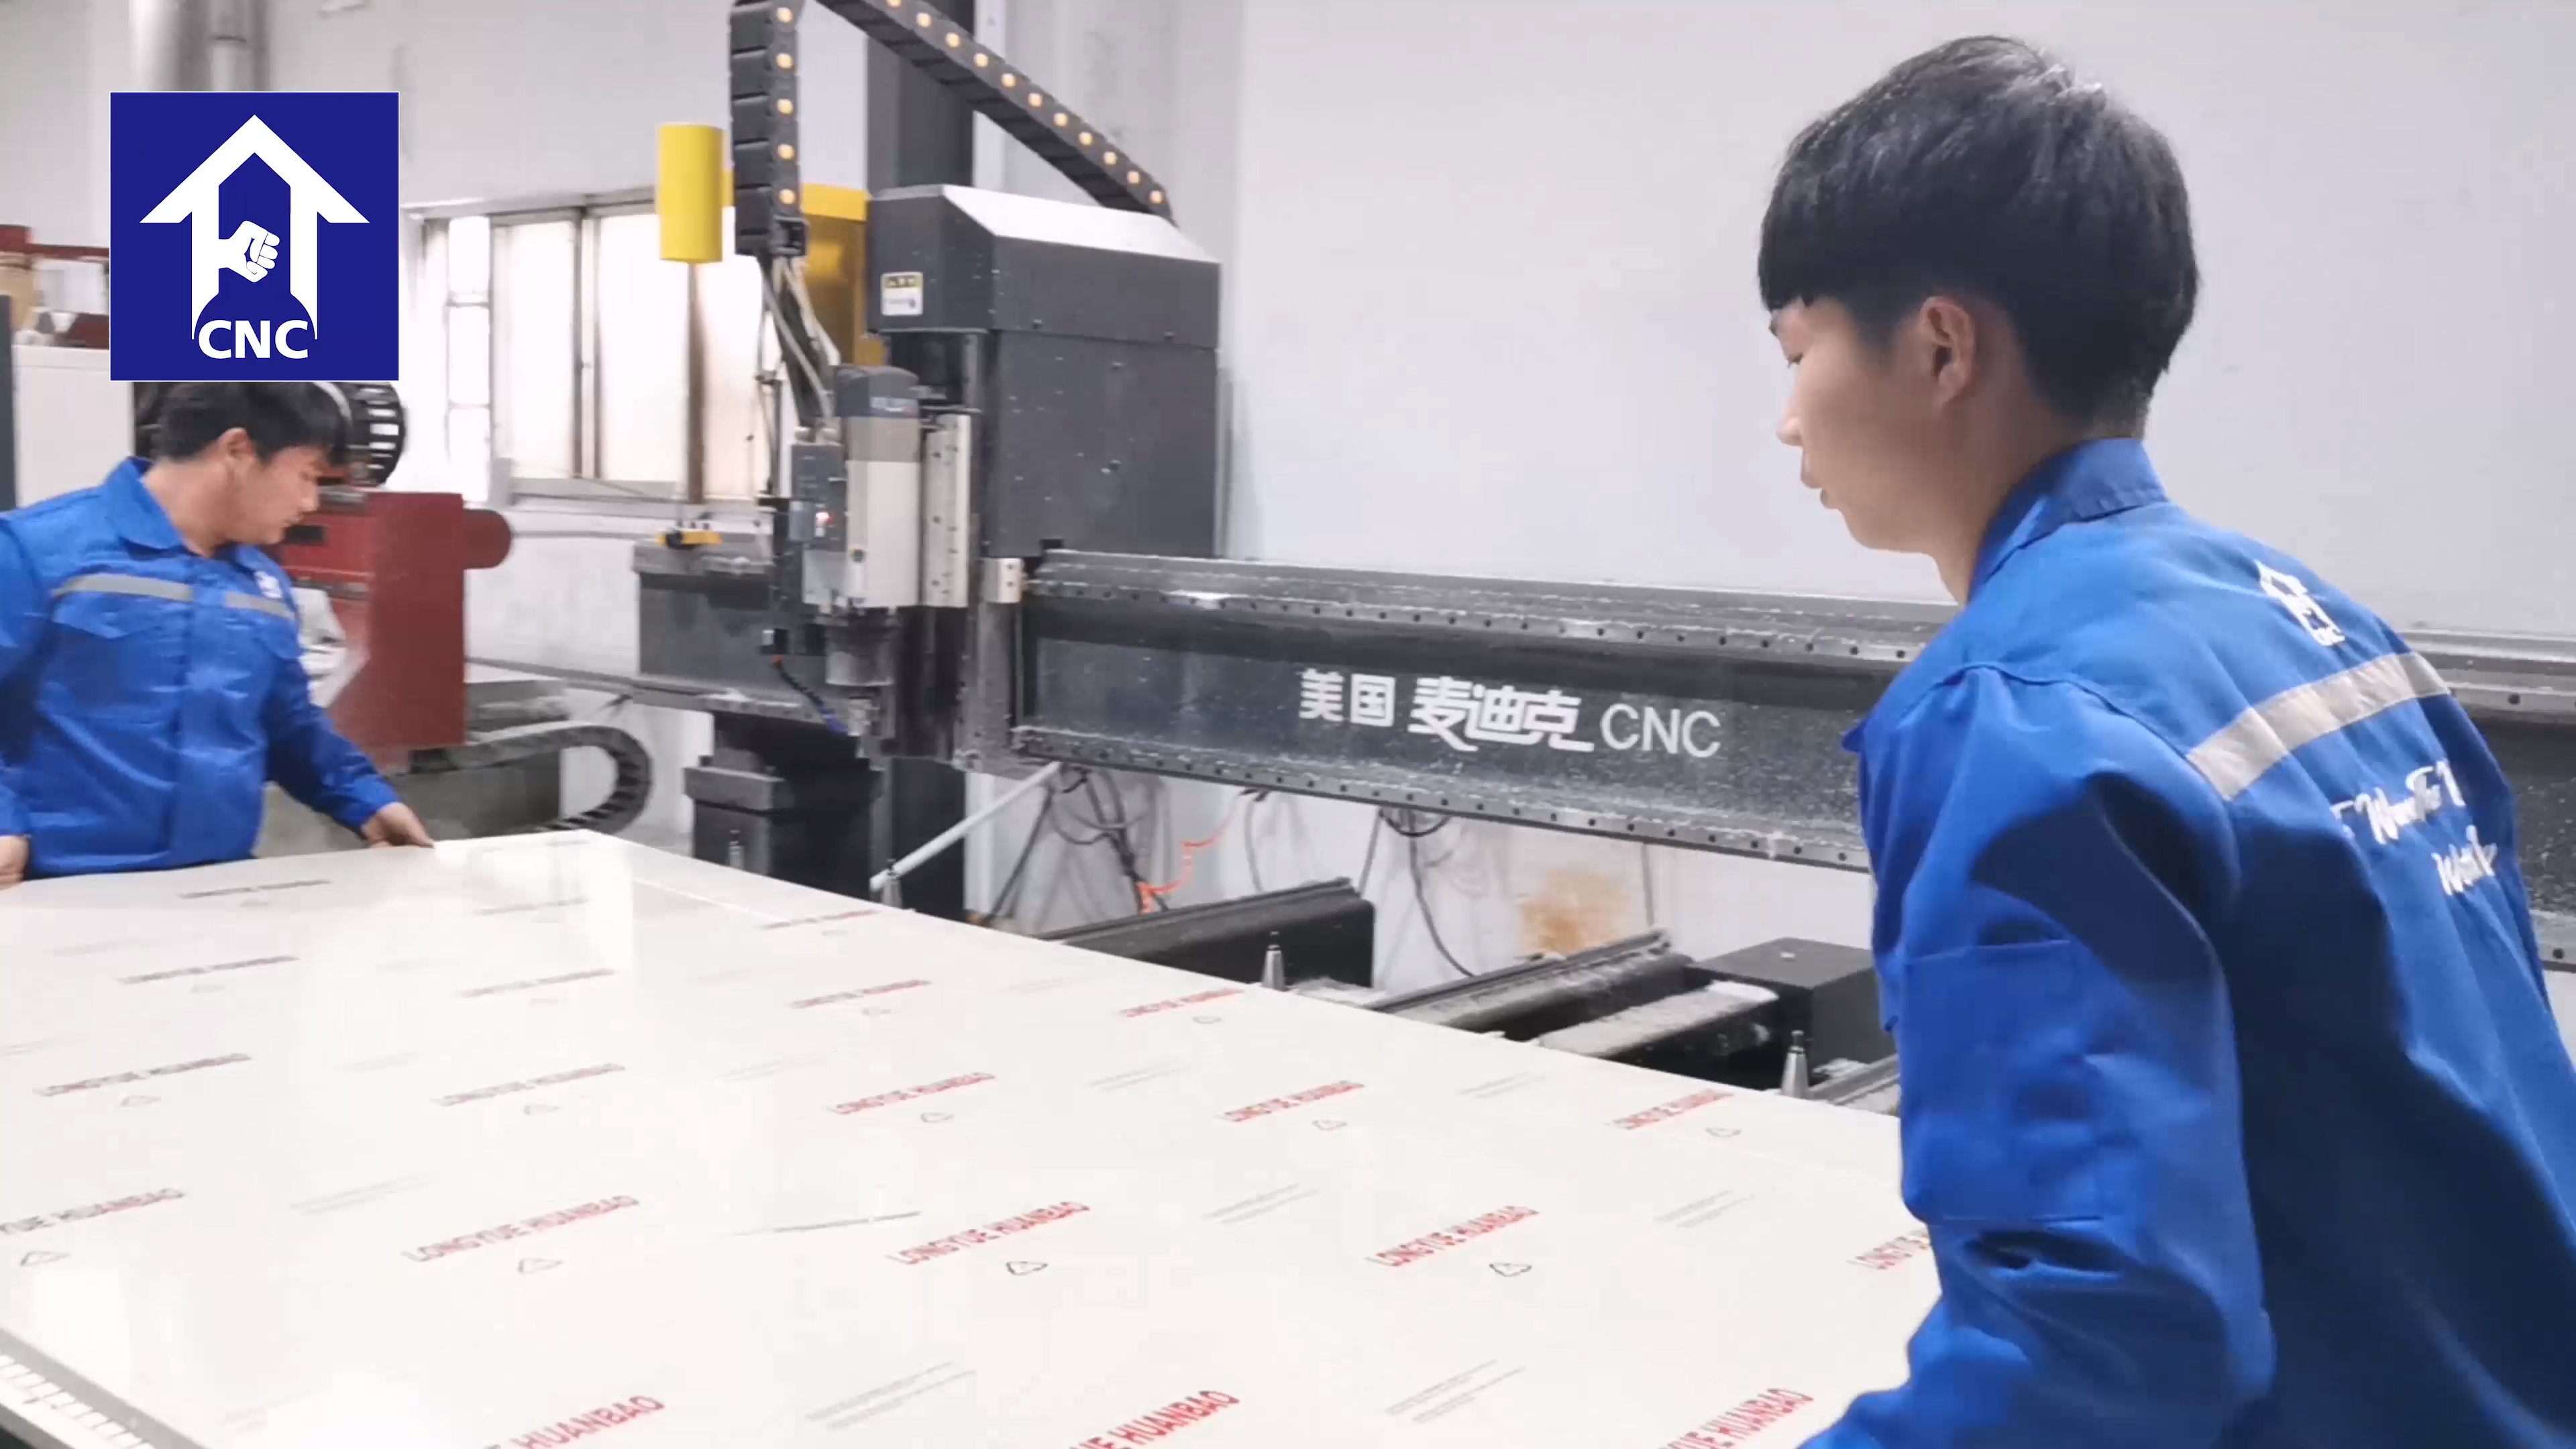 Hoge Kwaliteit Plastic Deel Custom Cnc Precisie Gefreesd Unilate Onderdelen